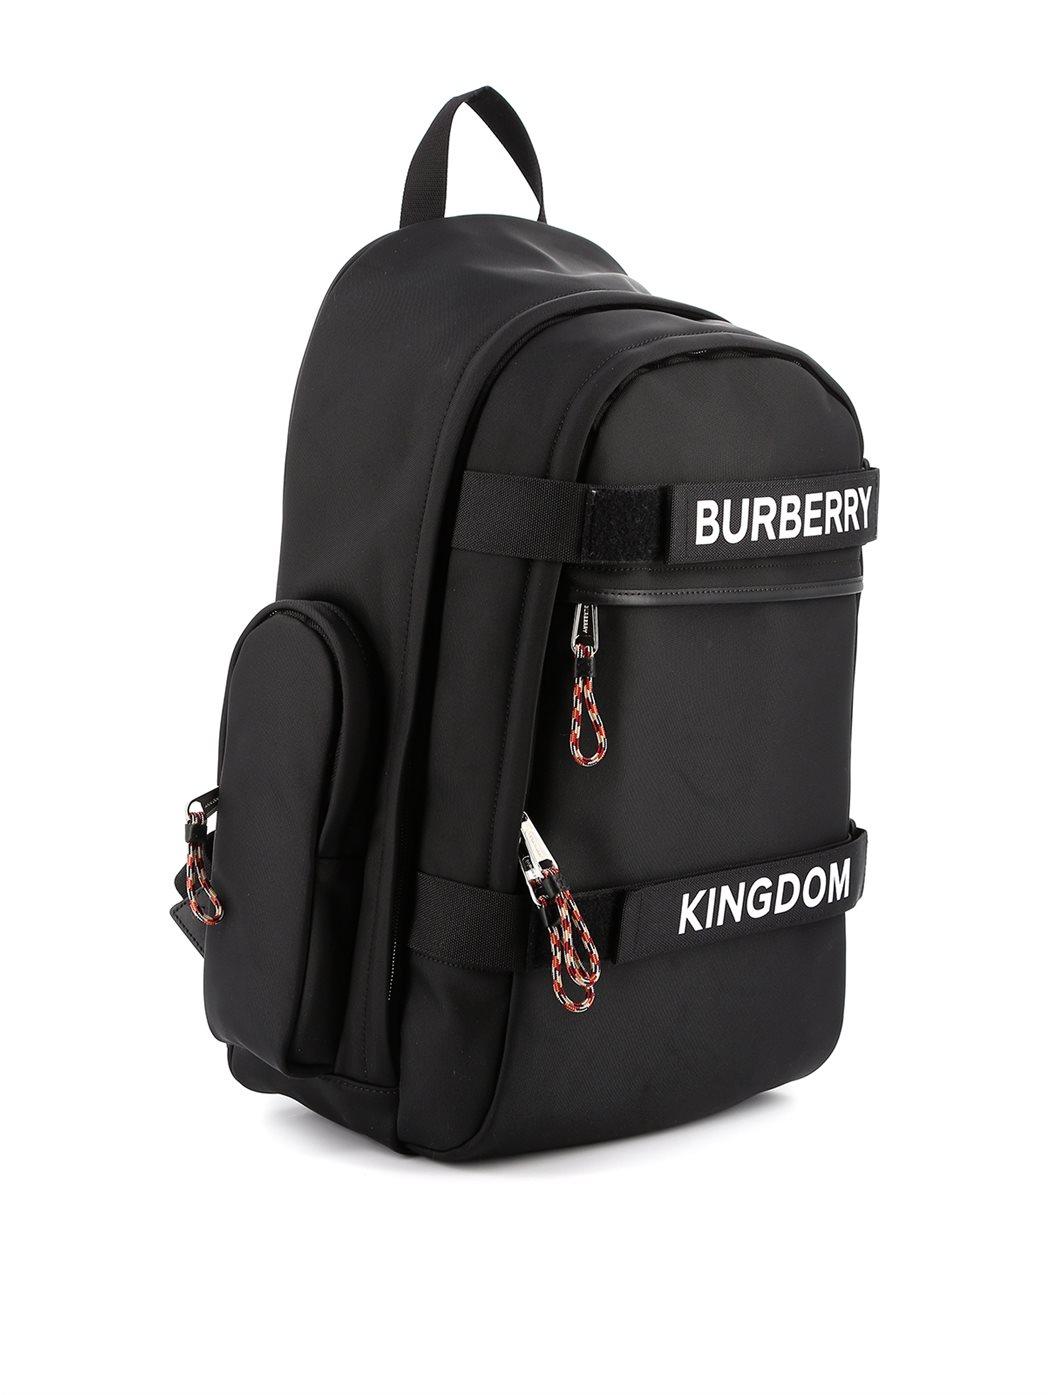 BURBERRY 8023569 Black-whit ZAINI